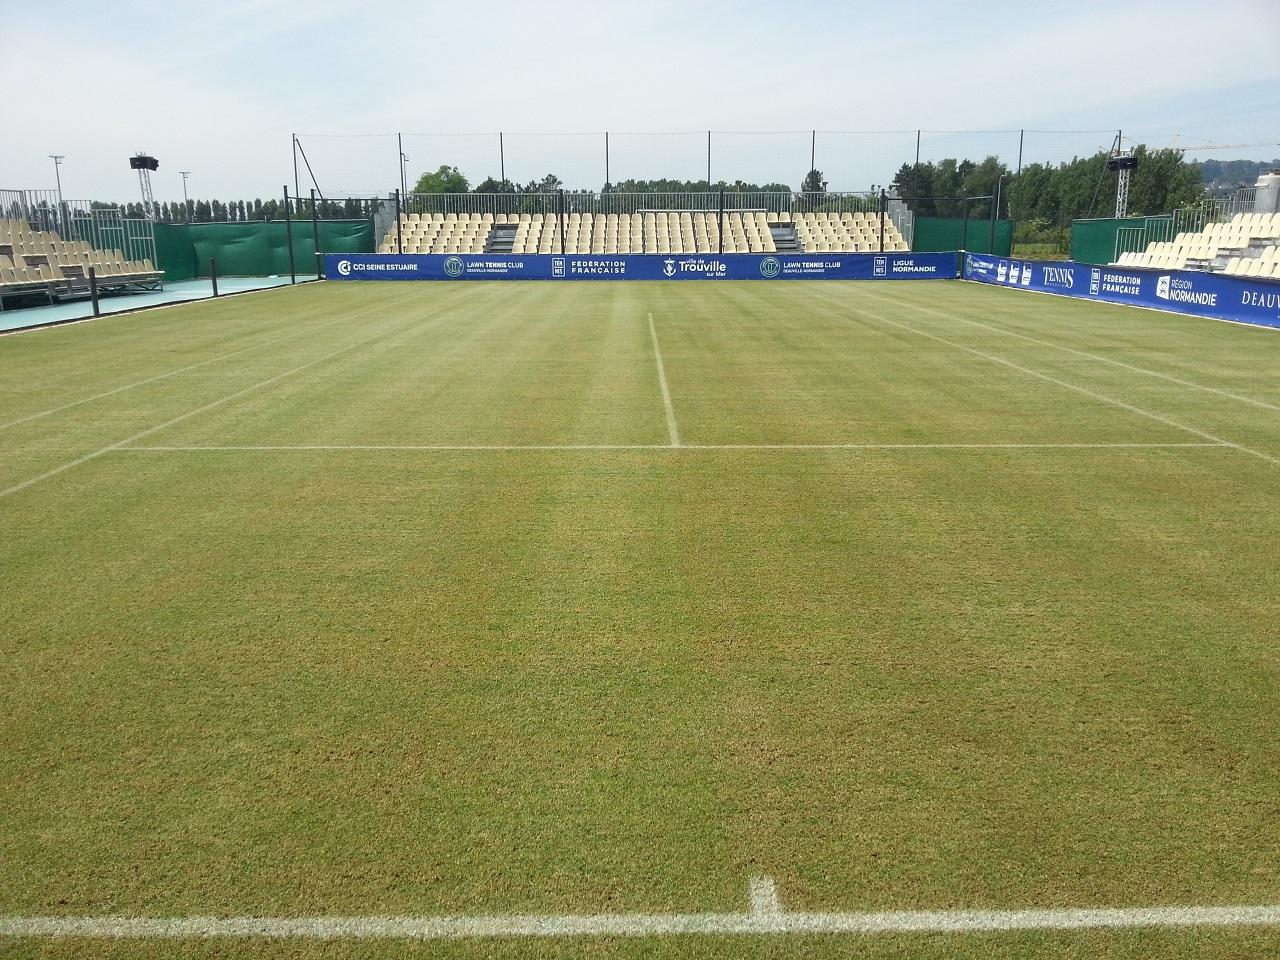 Cour Central Lawn Tennis Club Deauville-Normandie